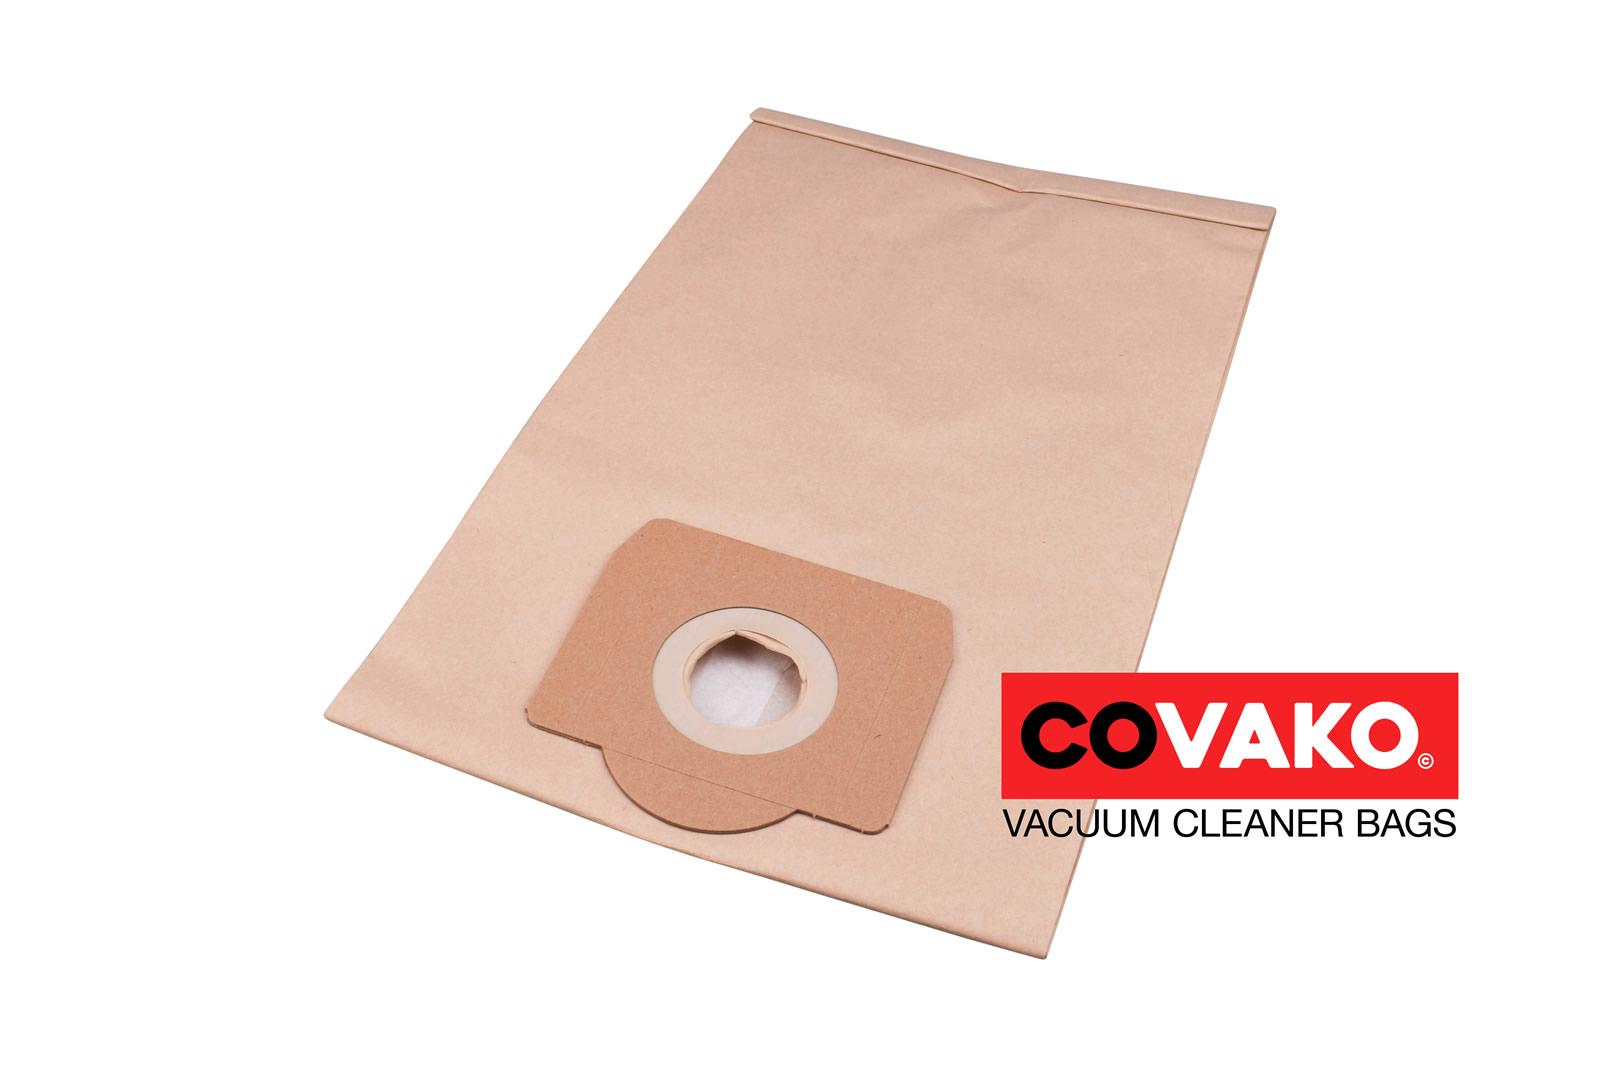 ICA G 16 P+ / Paper - ICA vacuum cleaner bags